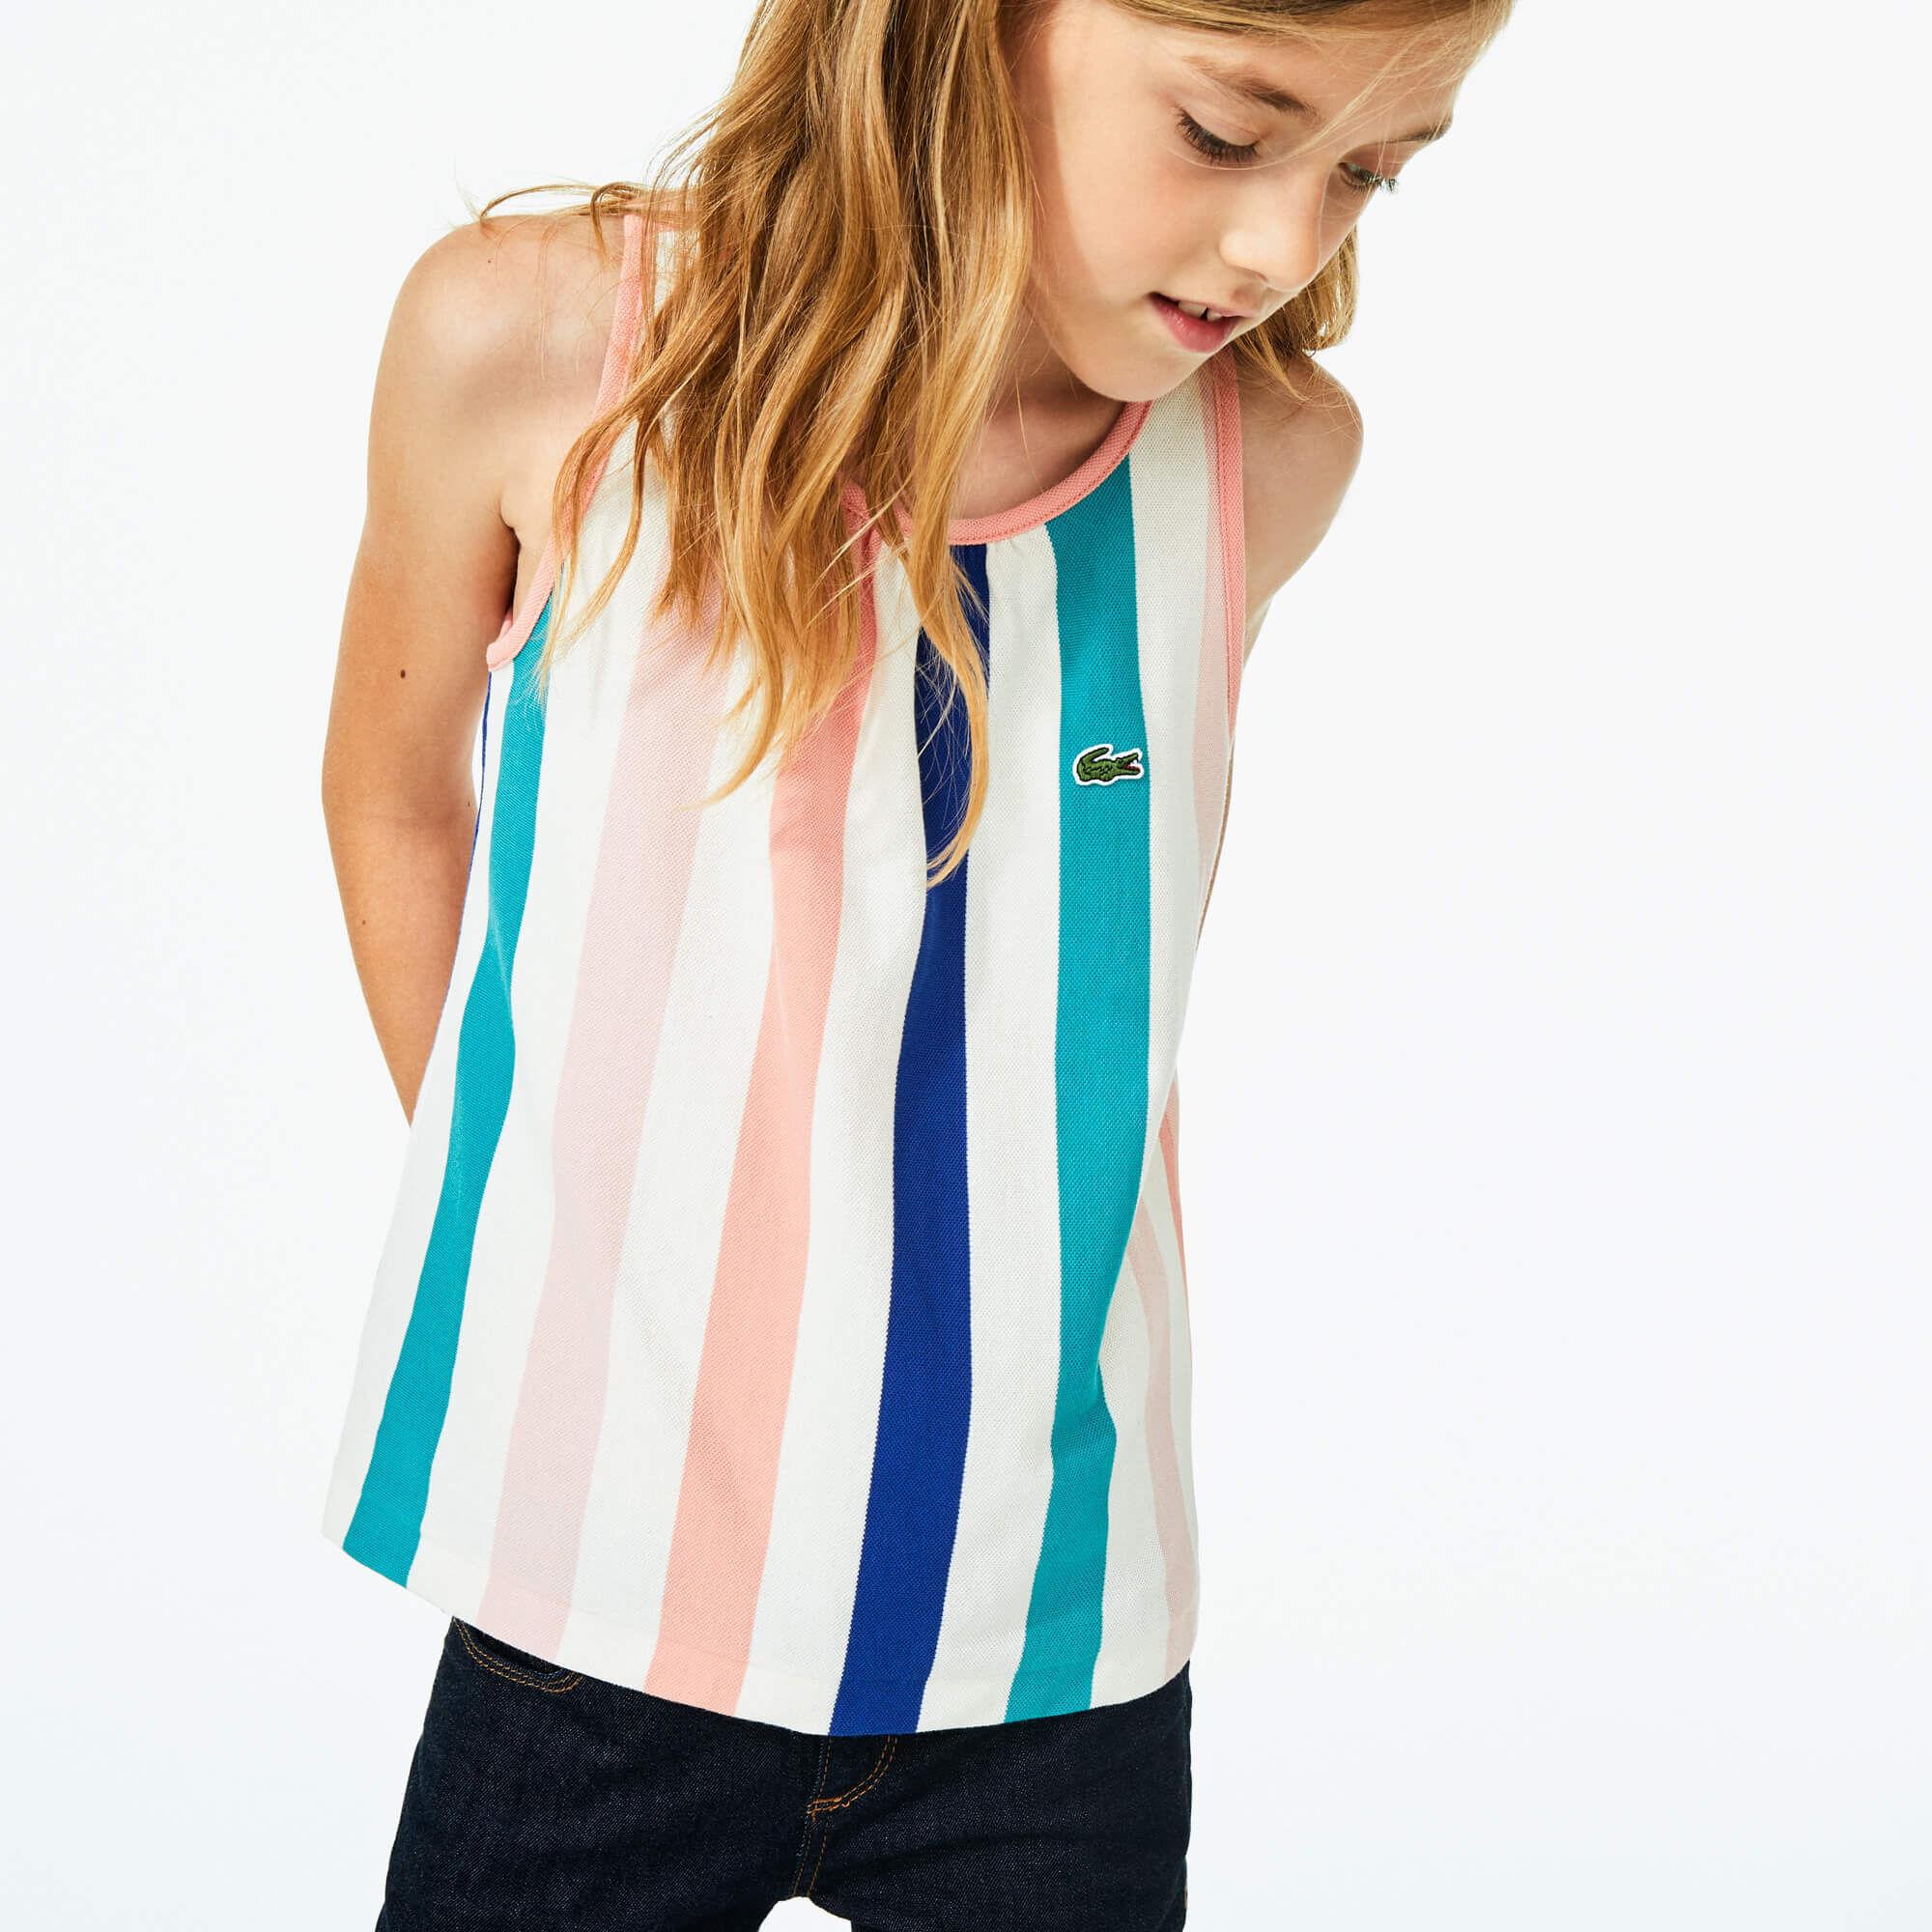 Girls' Striped Cotton Piqué Tank Top